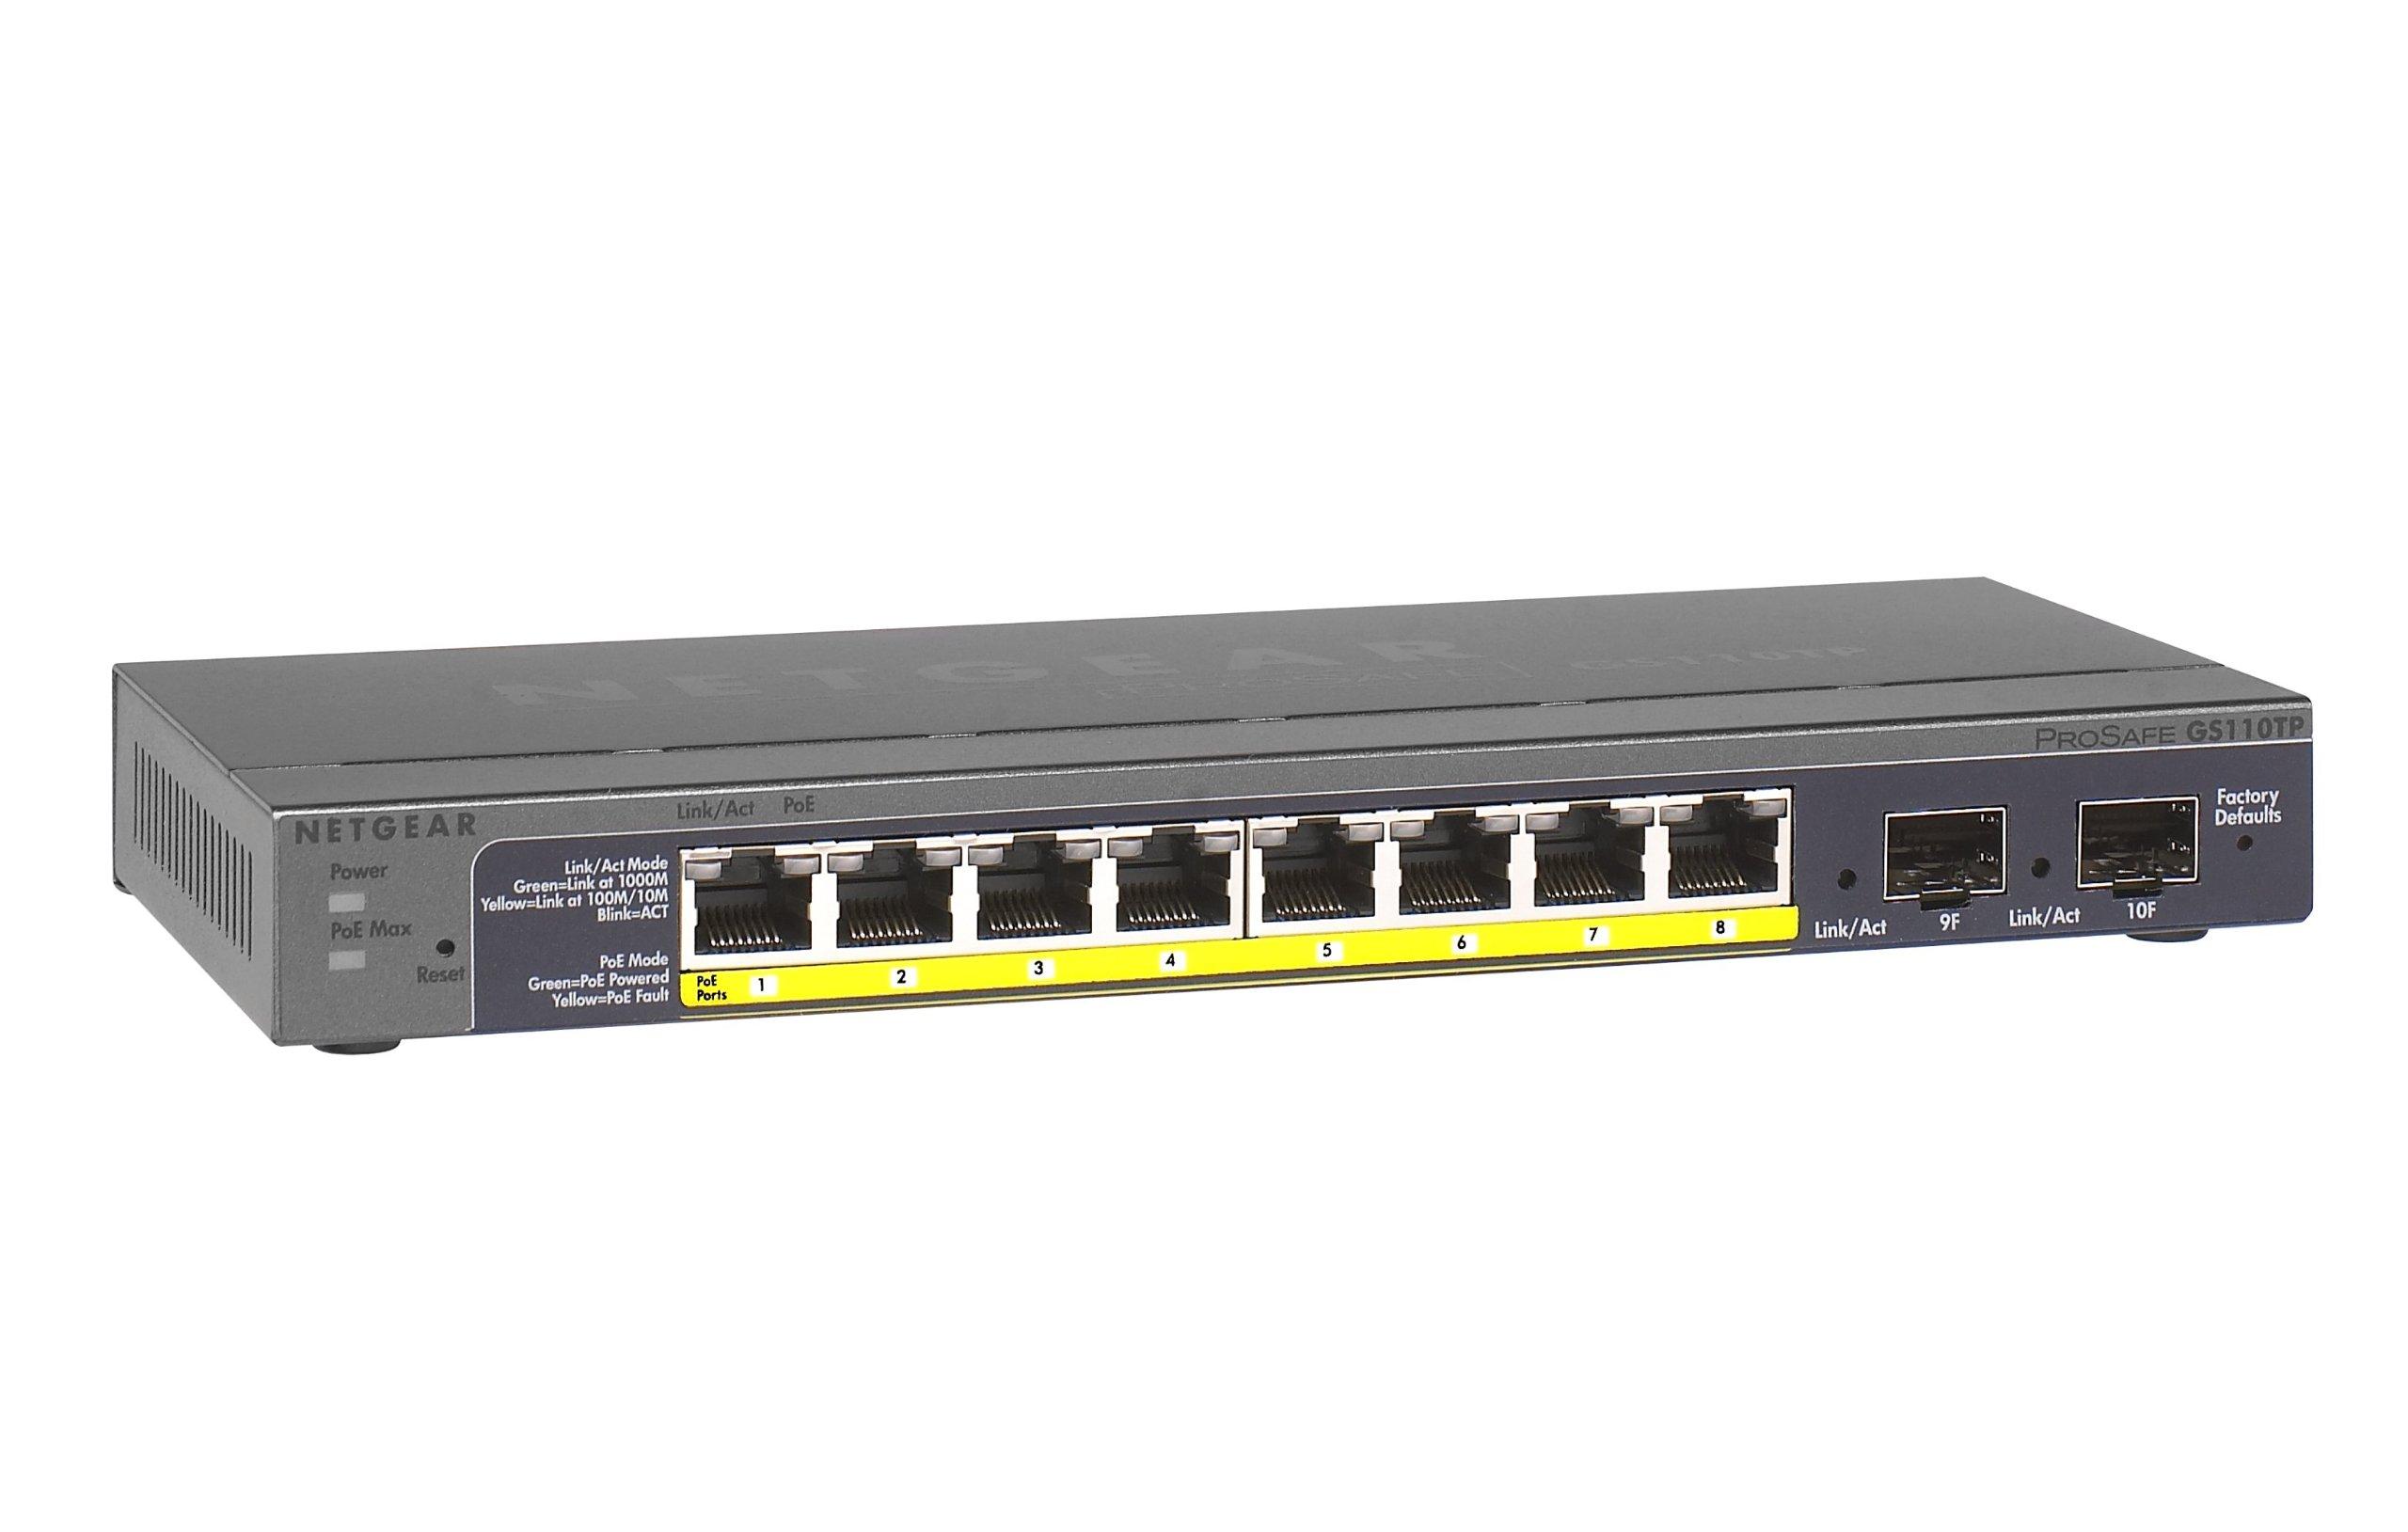 PoE//PoE+ 4 SFP GS728TP NETGEAR GS728TP-100NAS 24-Port Gigabit Ethernet Smart Managed Pro Switch 192w ProSAFE Lifetime Protection